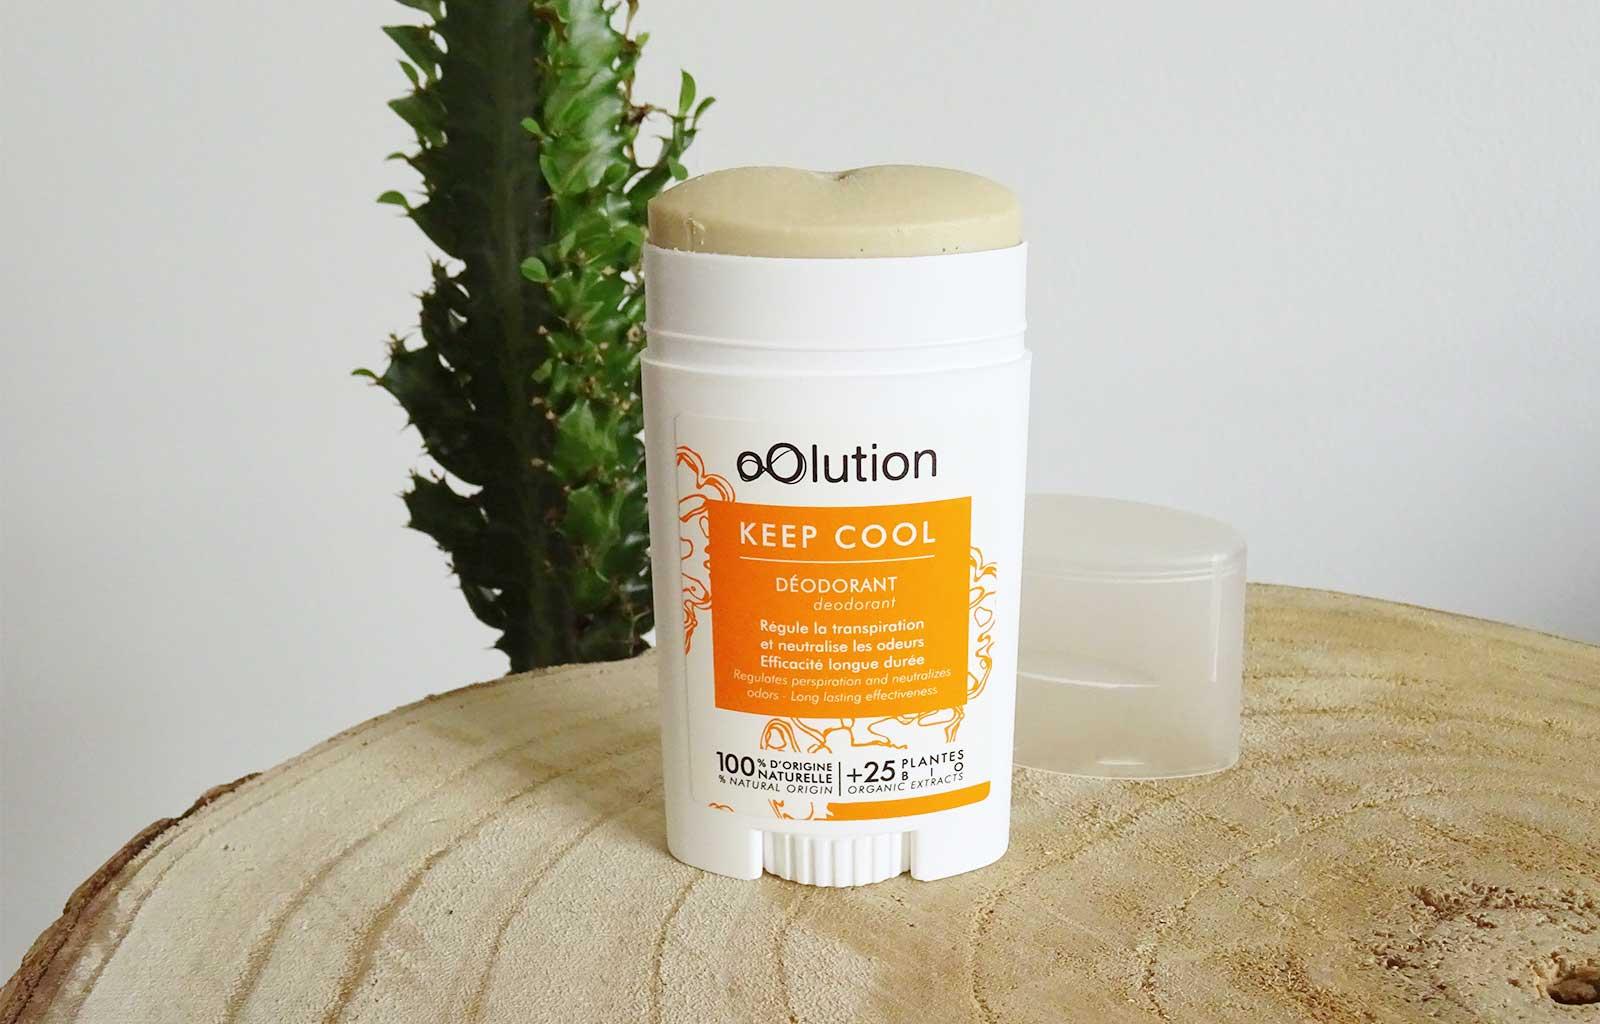 déodorant keep cool oolution